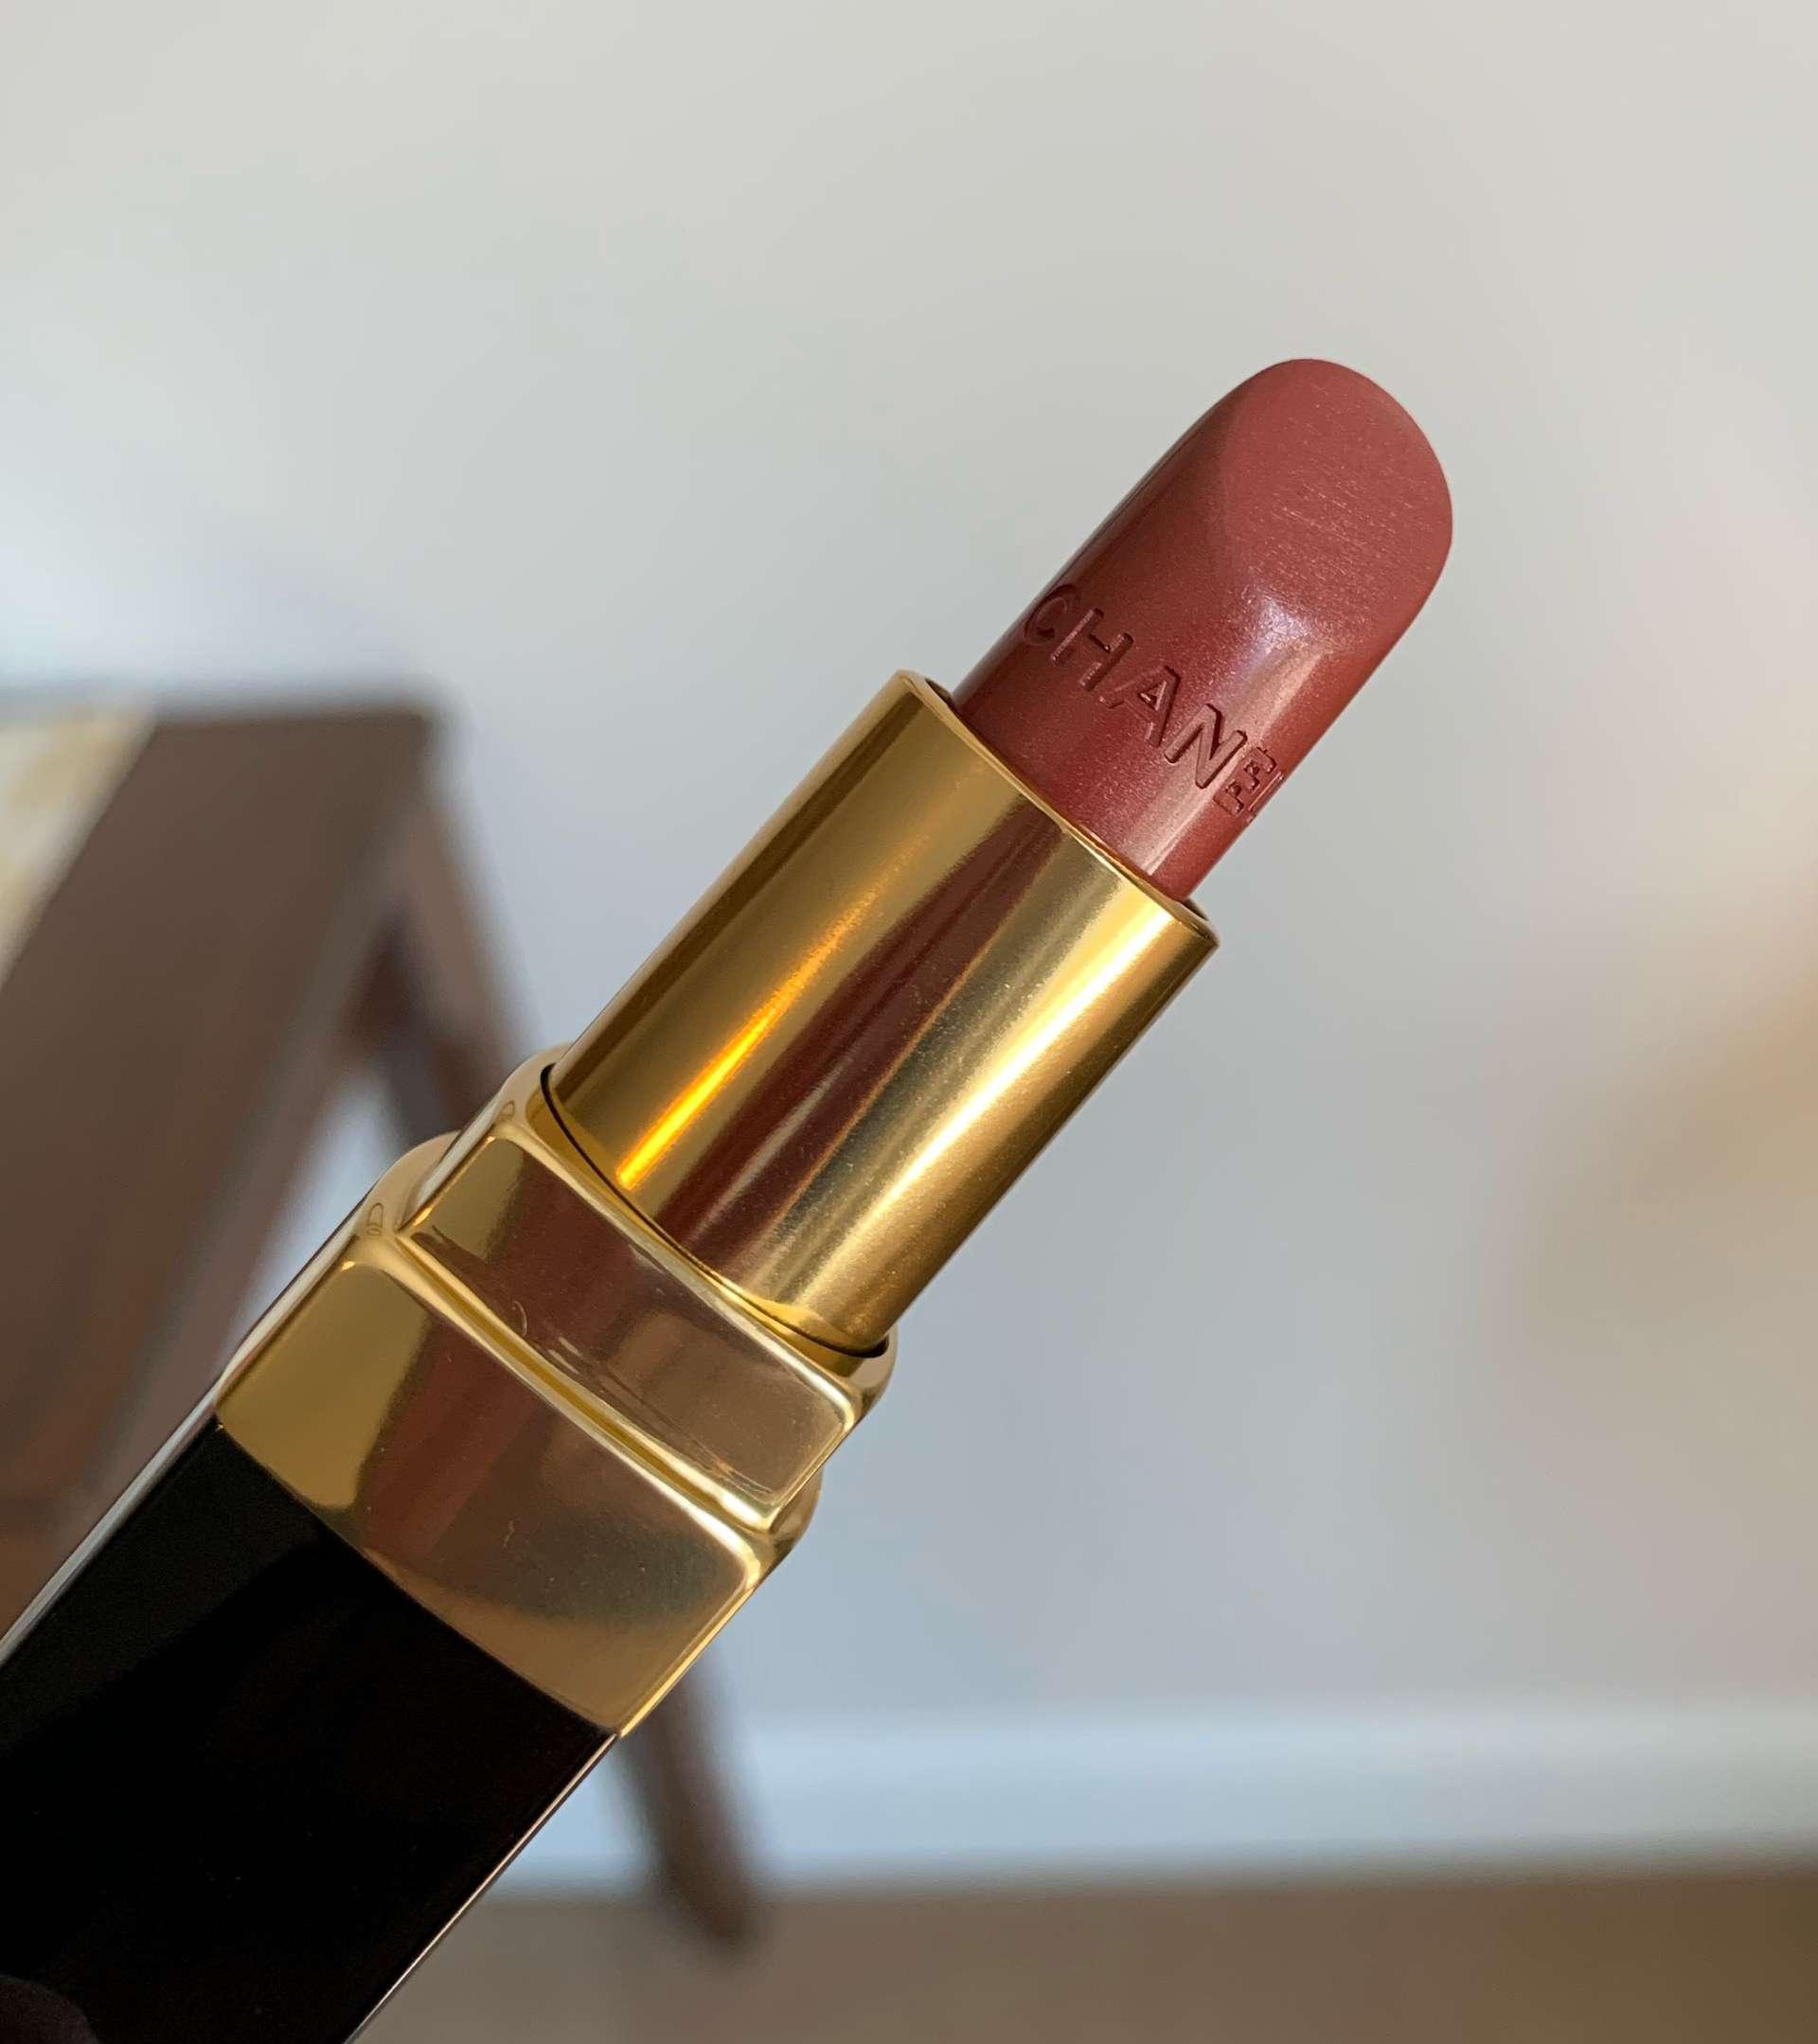 Chanel Rouge Coco Ultra Hydrating Lipstick 406 Antoinette Swatch on Medium Dark Skin